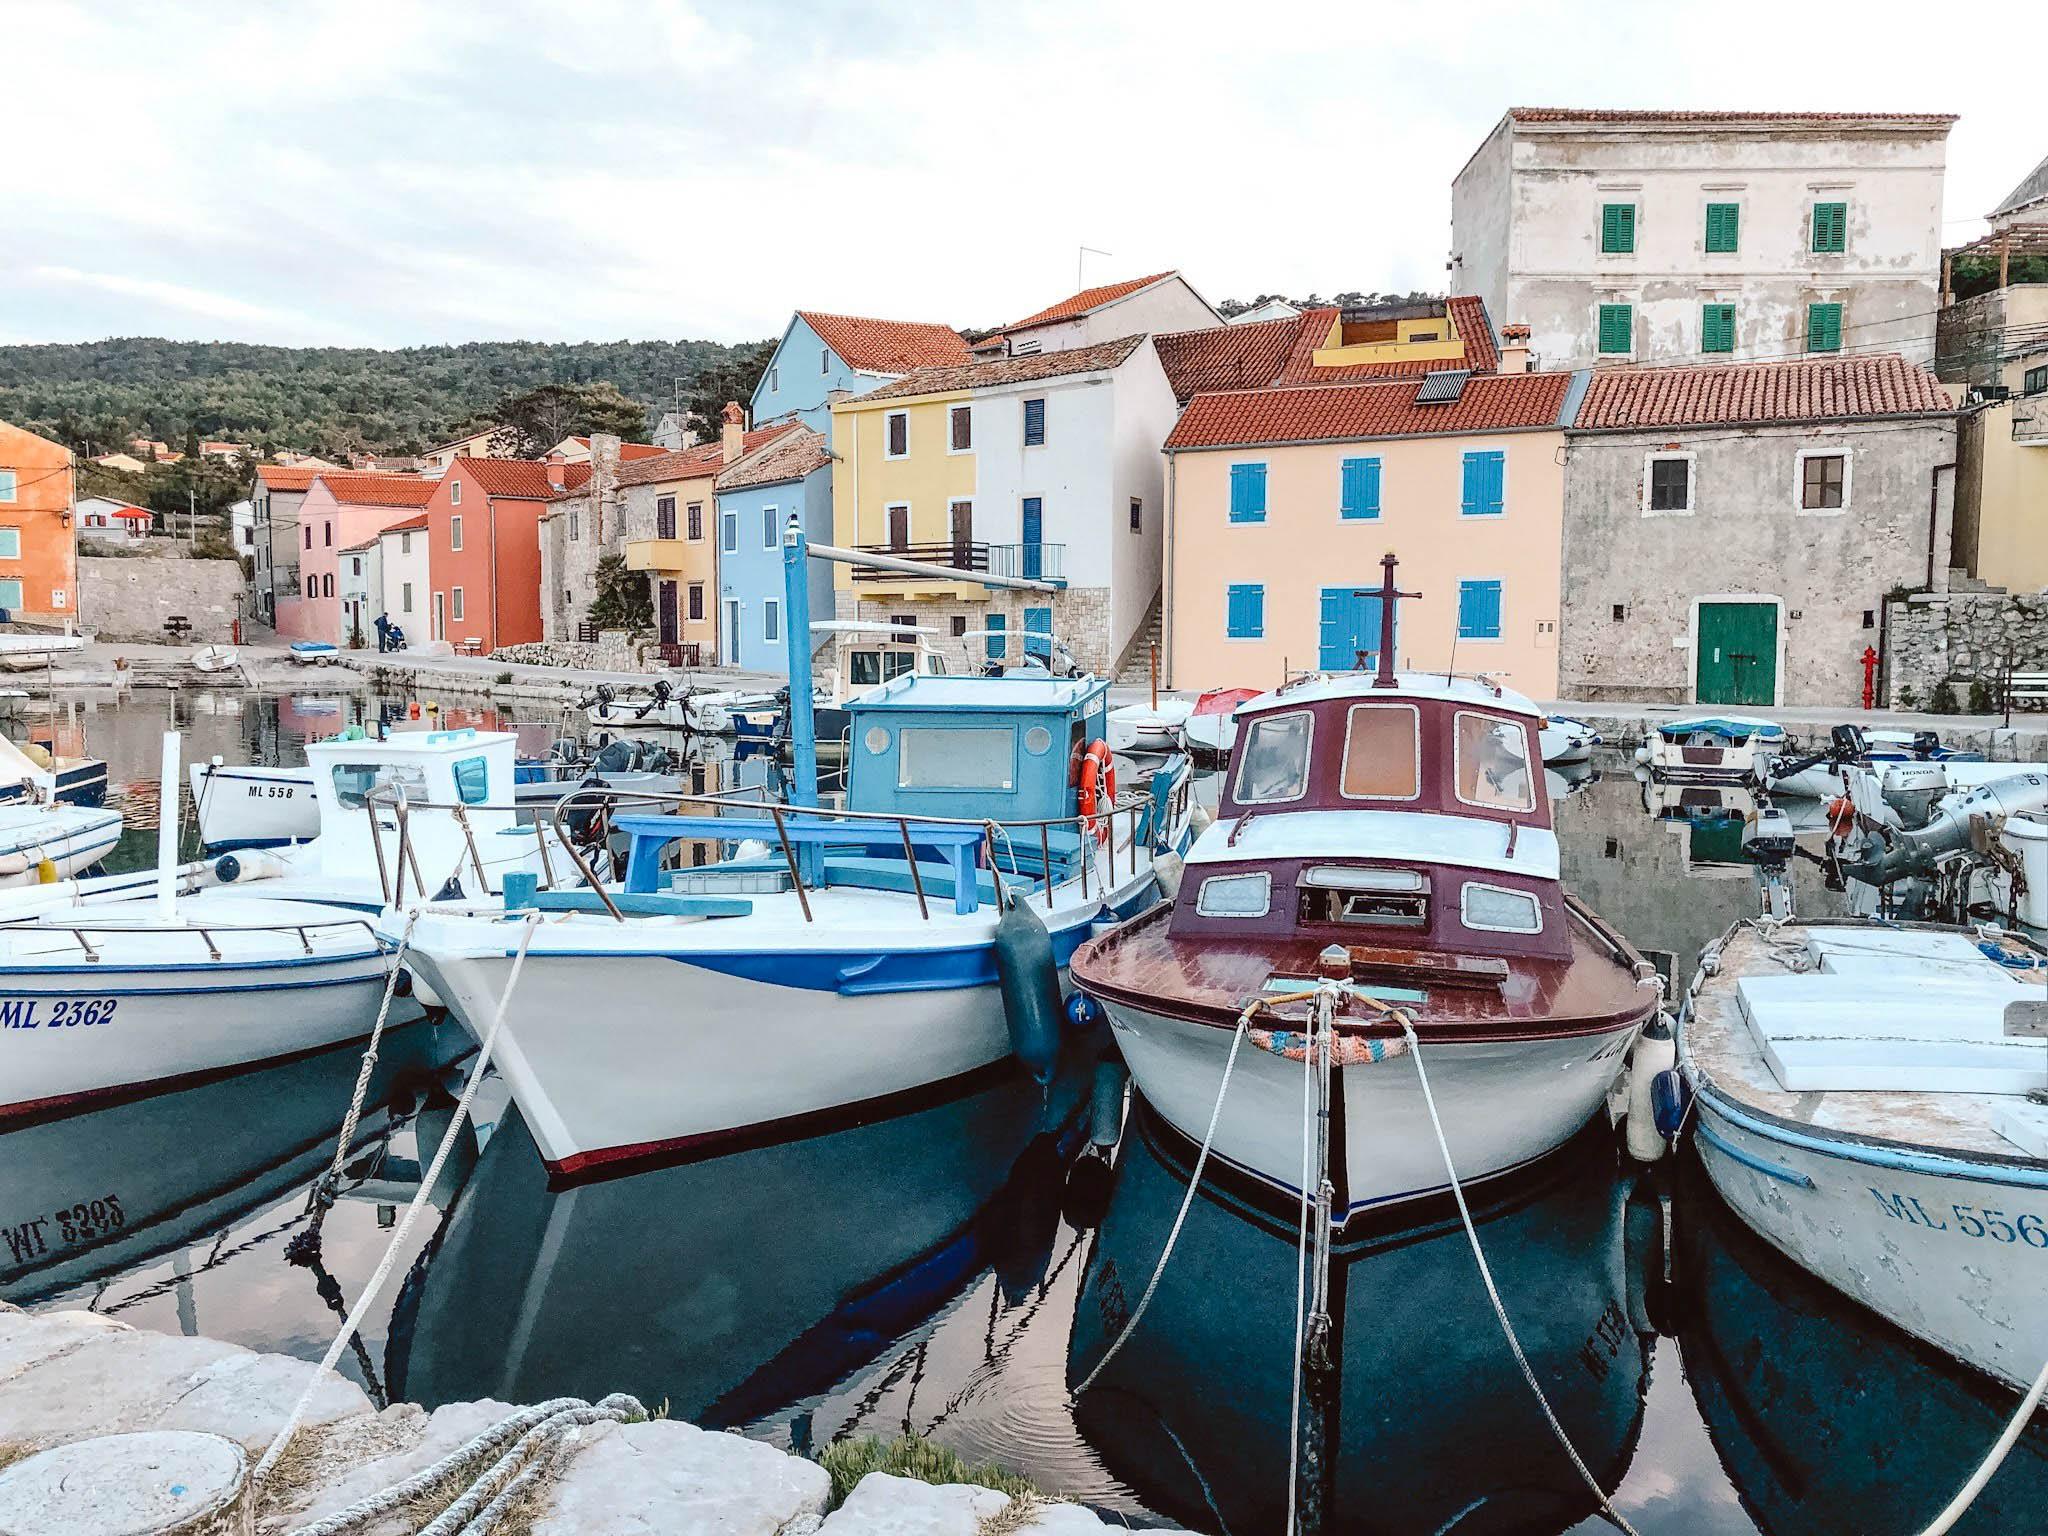 Boats in the harbor of Veli Lôsinj, Croatia